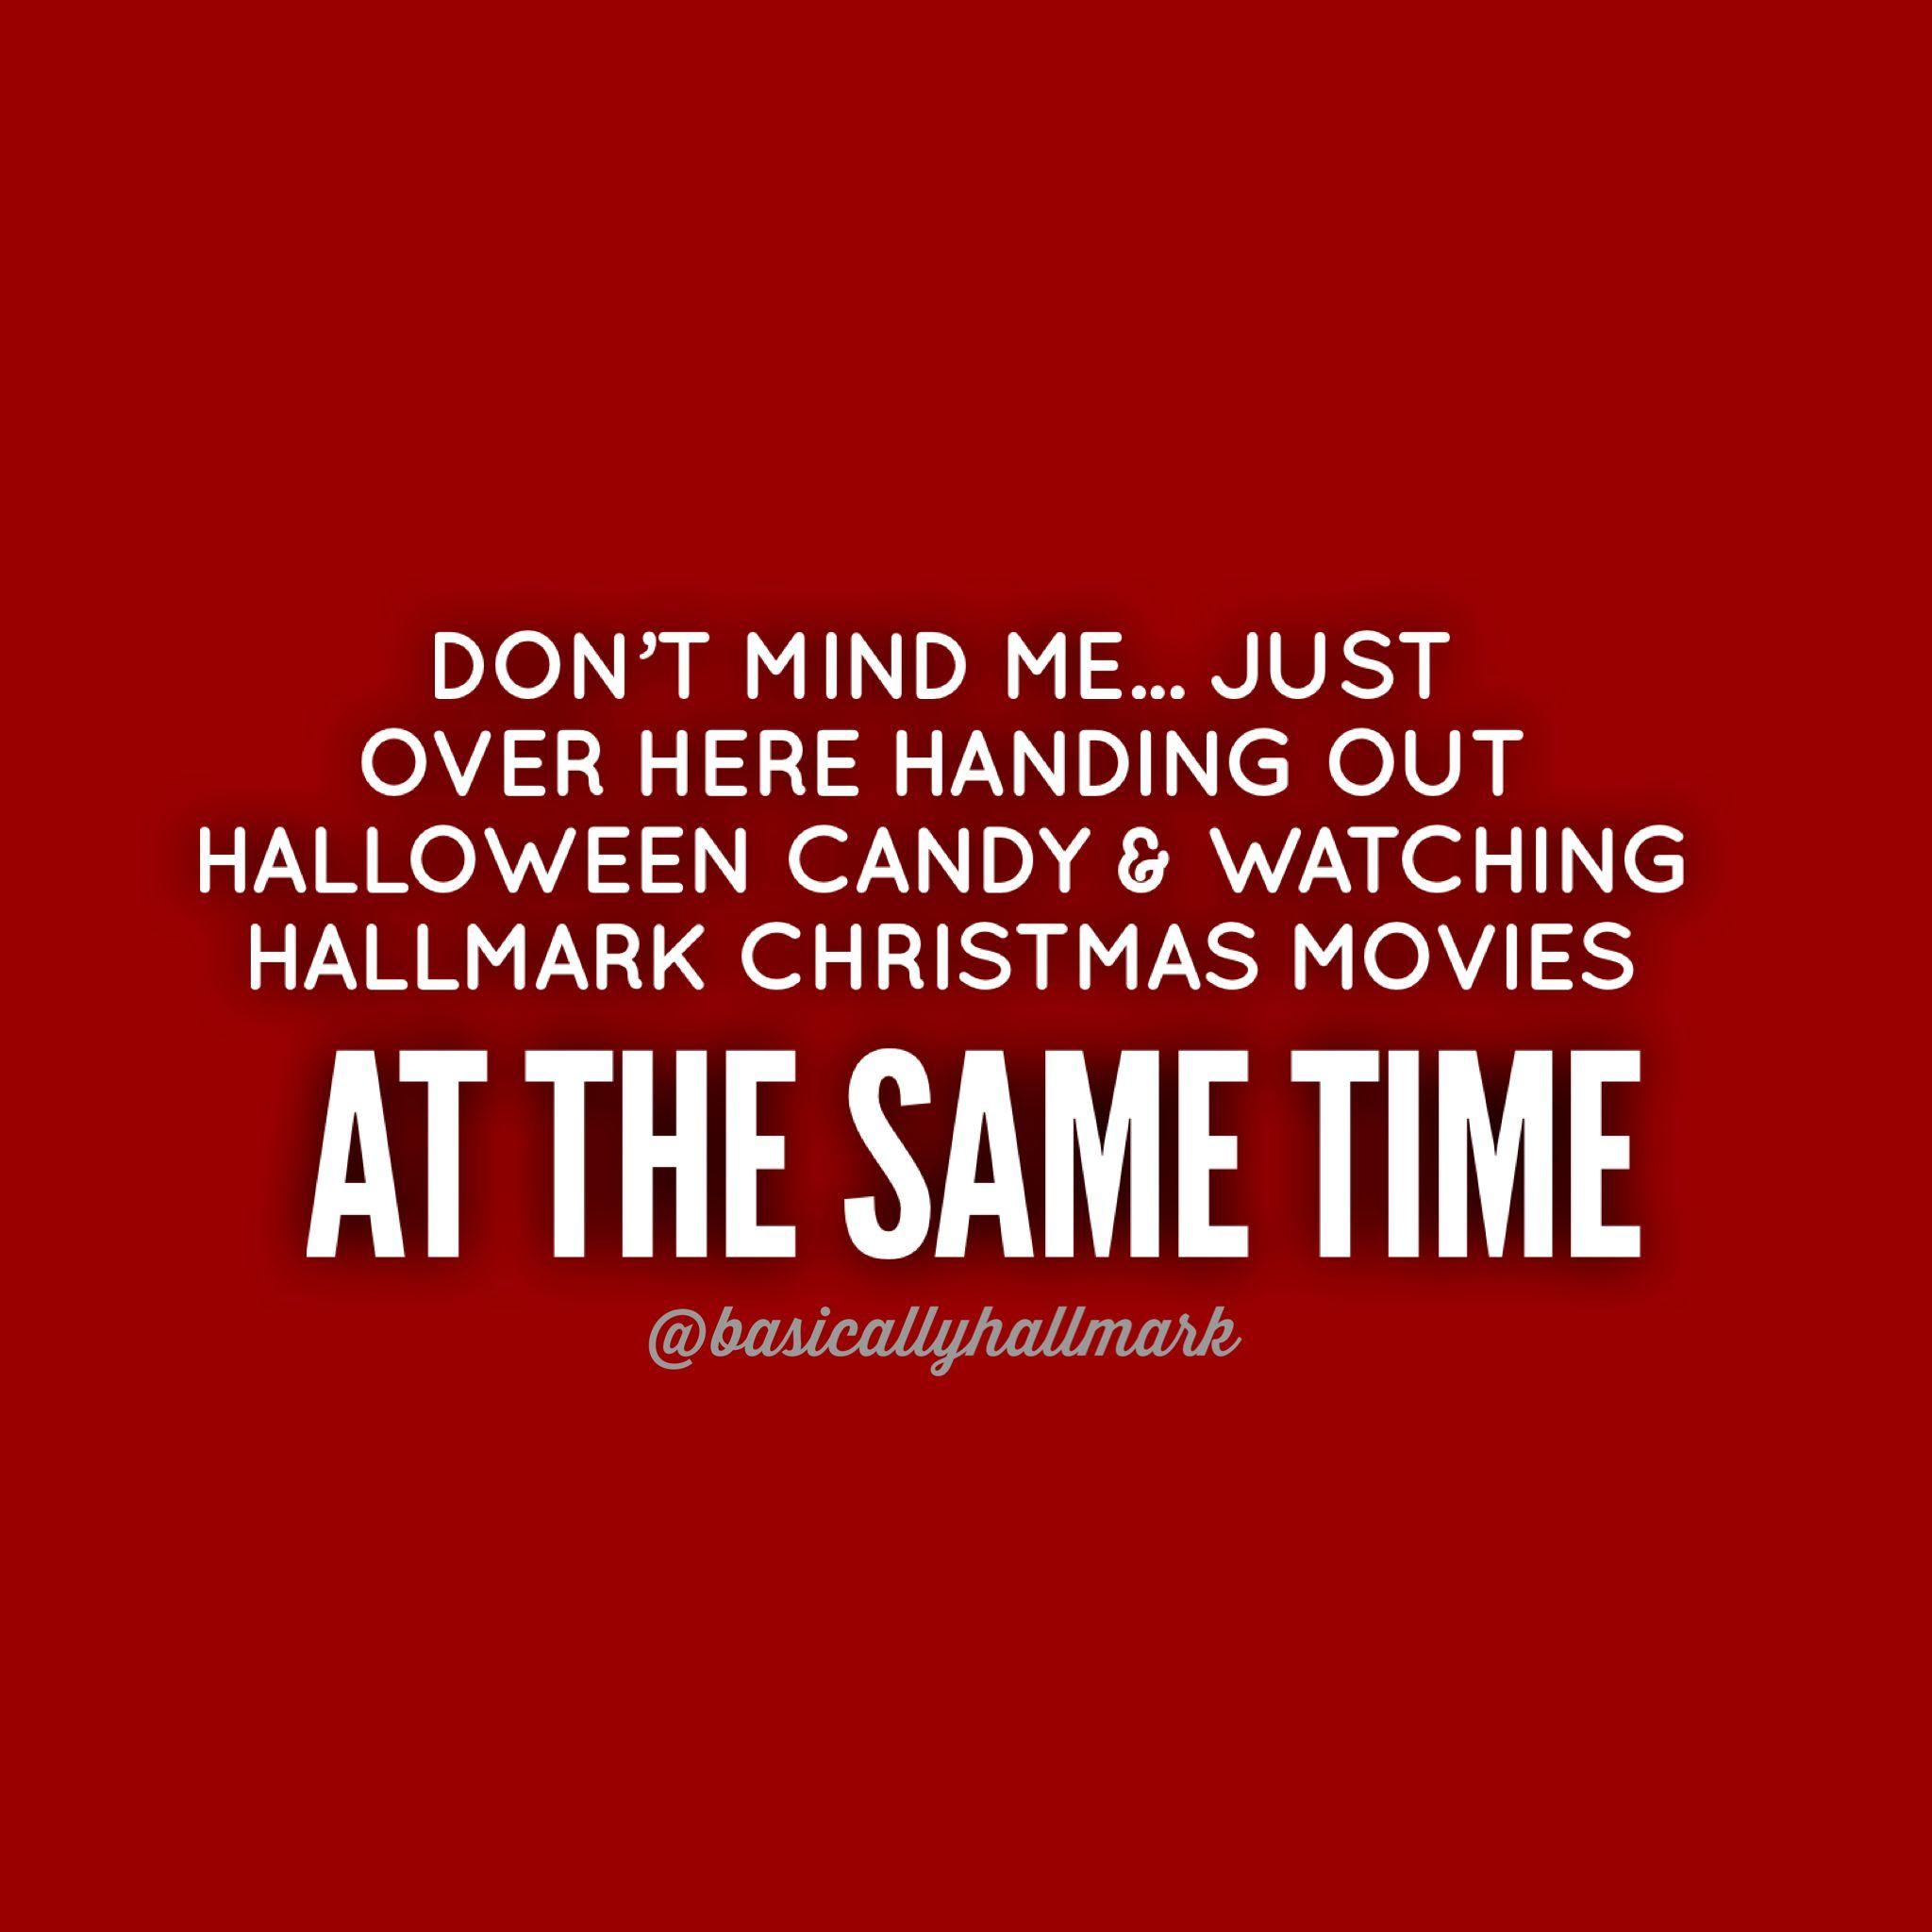 Halloween Hallmark Meme Fallmemes Halloween Christmas Memes Funny Quotes Trickortrea Christmas Quotes Funny Christmas Movie Quotes Funny Movie Memes